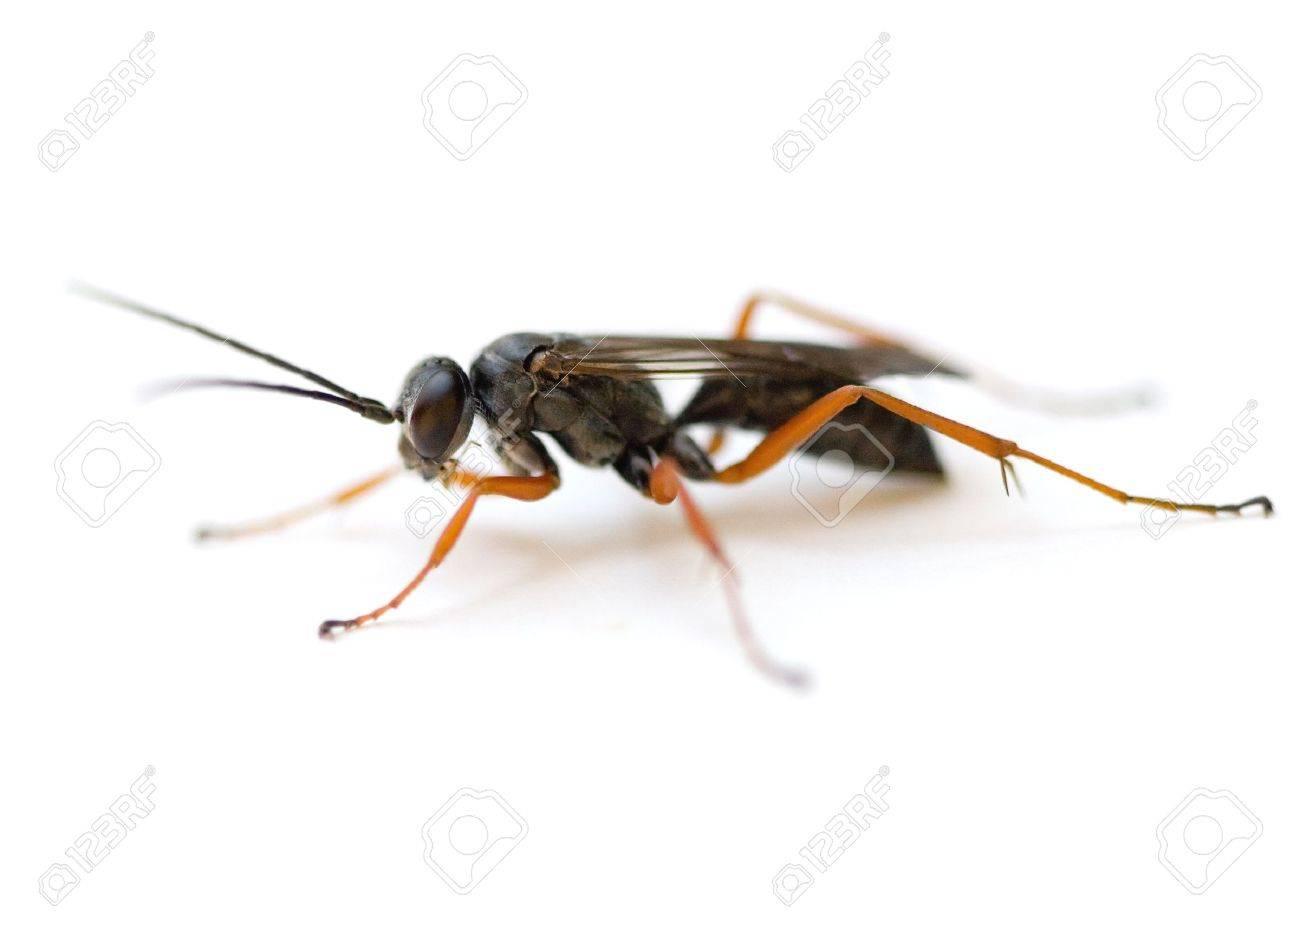 Spider Wasp (Auplopus mellipes) isolated on white background. Stock Photo - 7493382